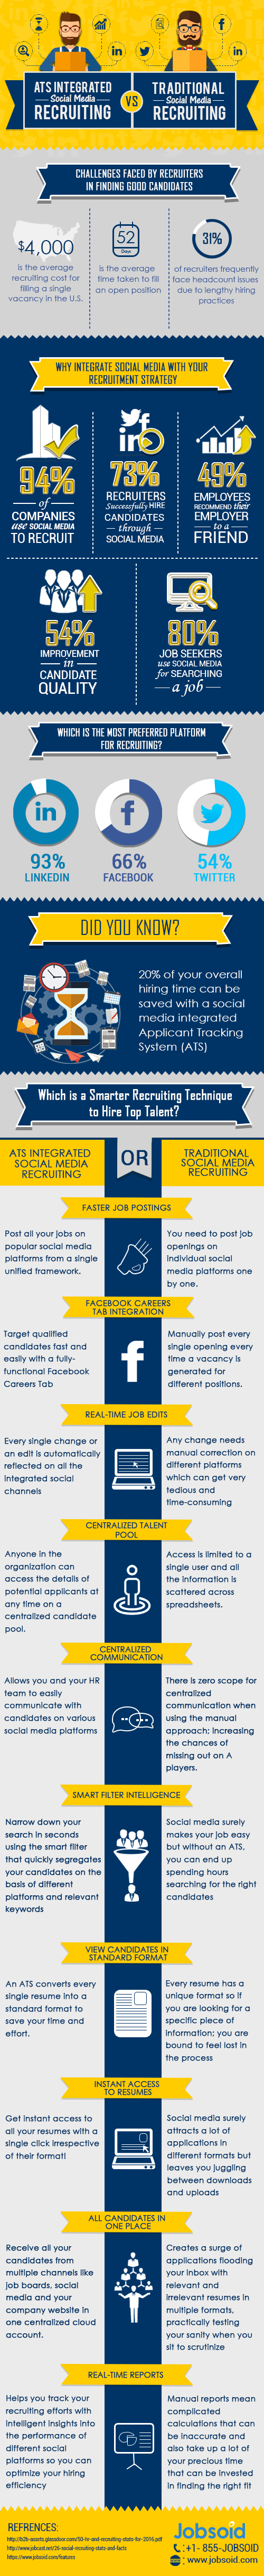 ATS-Integrated-Social-Media-Recruiting